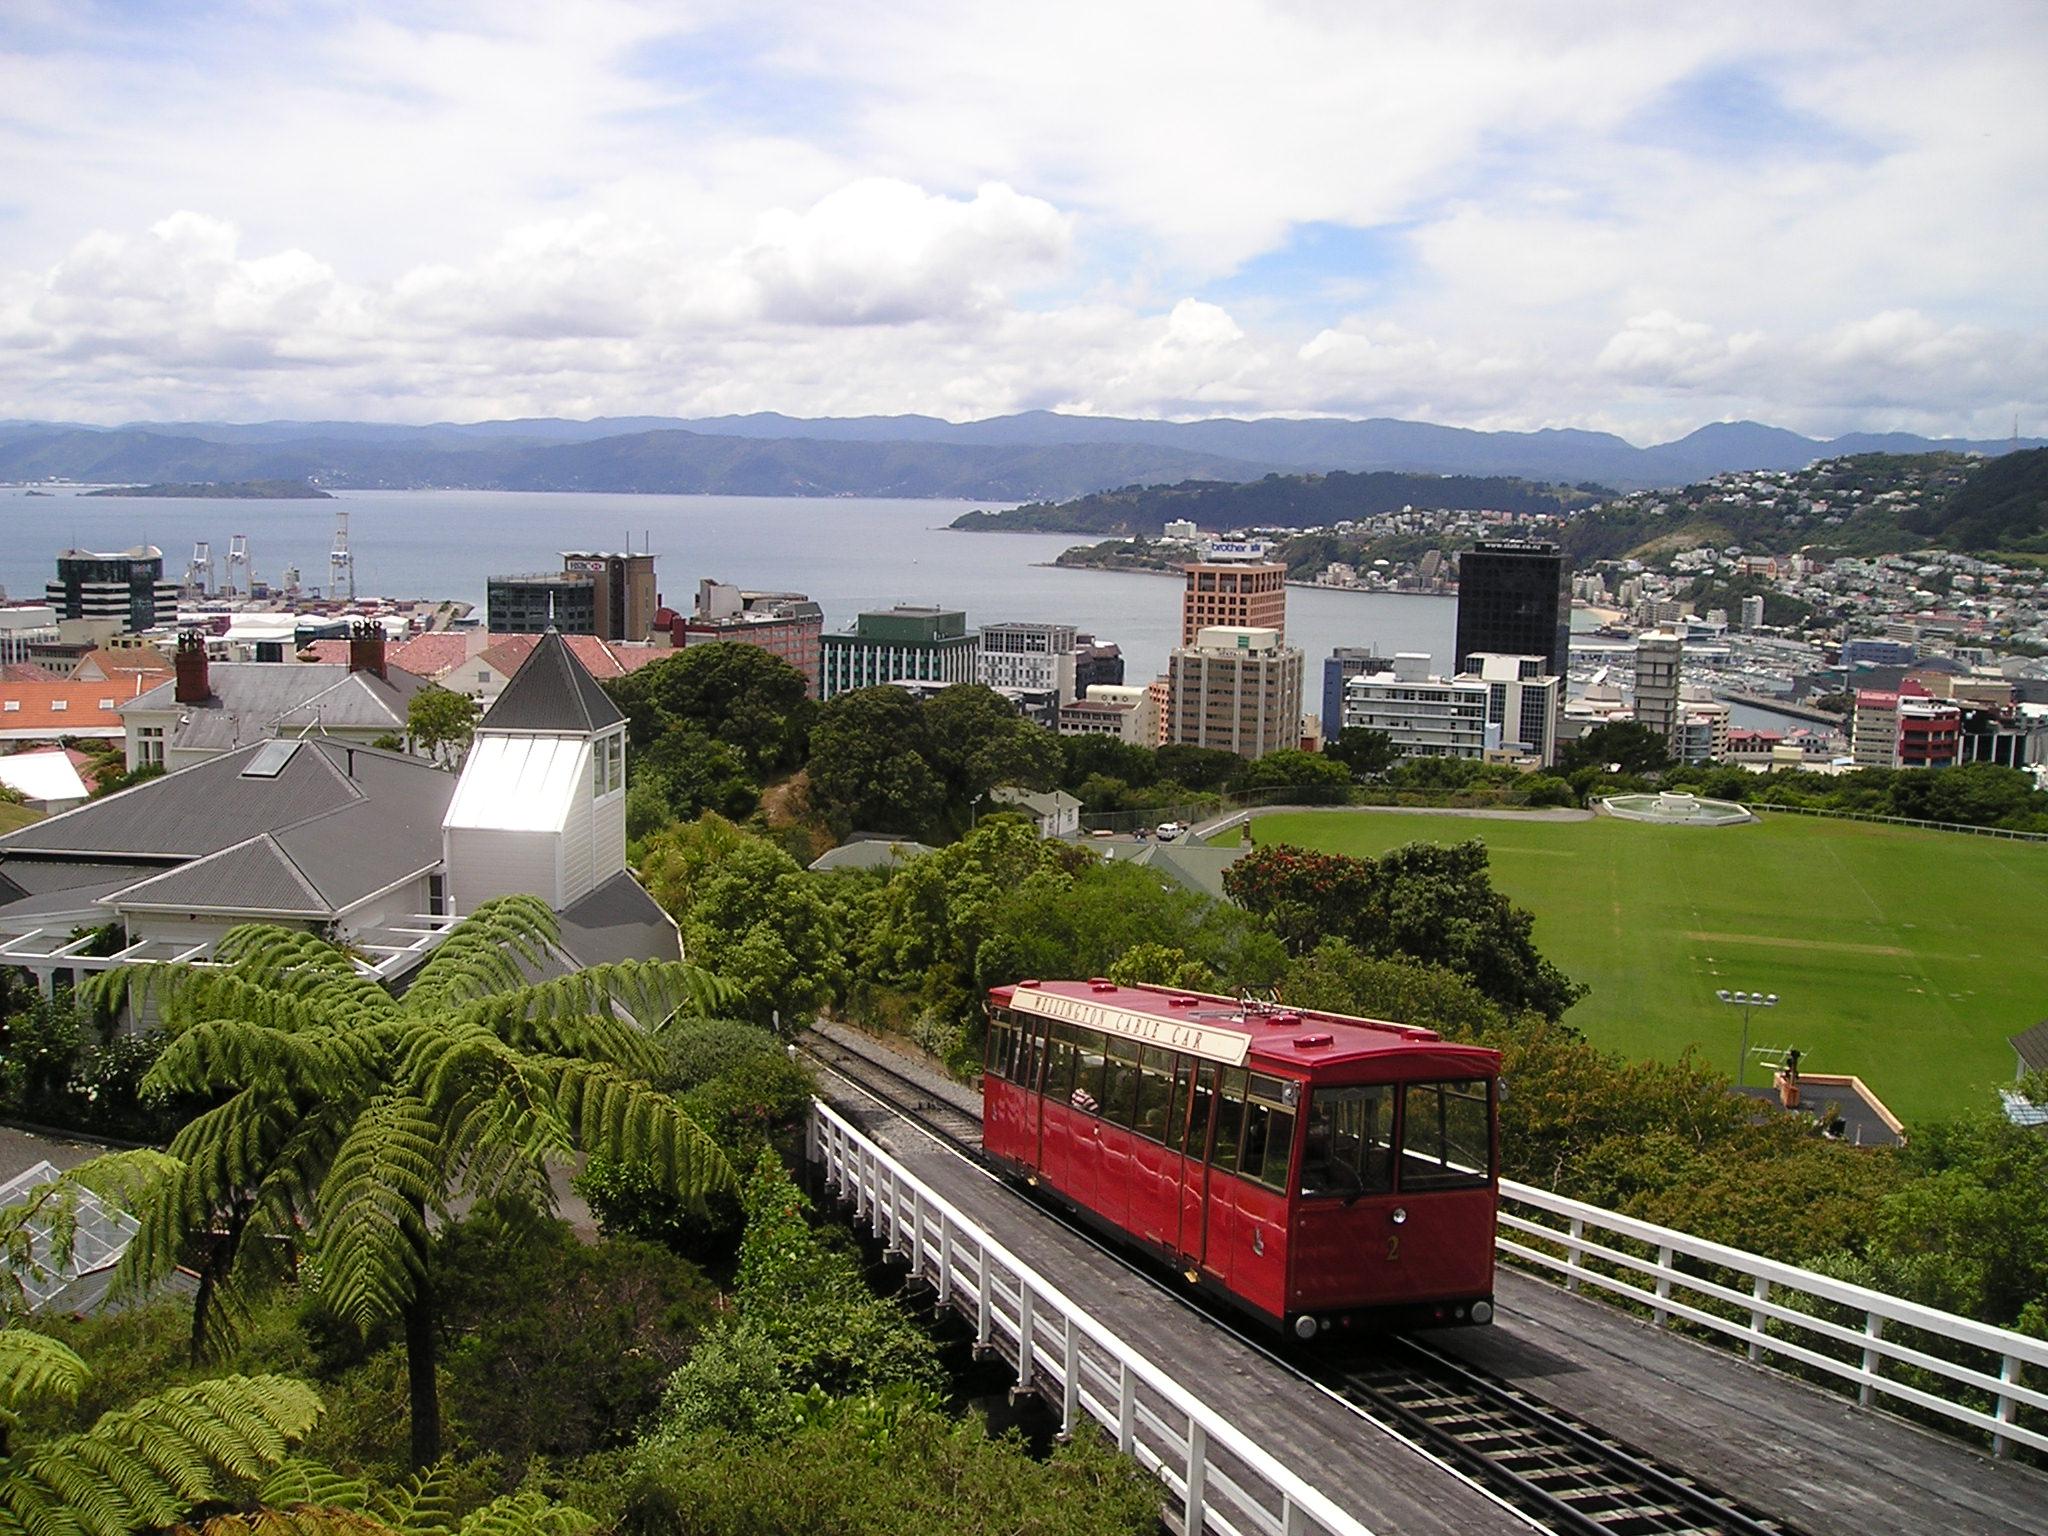 Nowa Zelandia Strzelanina Wikipedia: File:Wellington Cable Car (public Domain).jpg